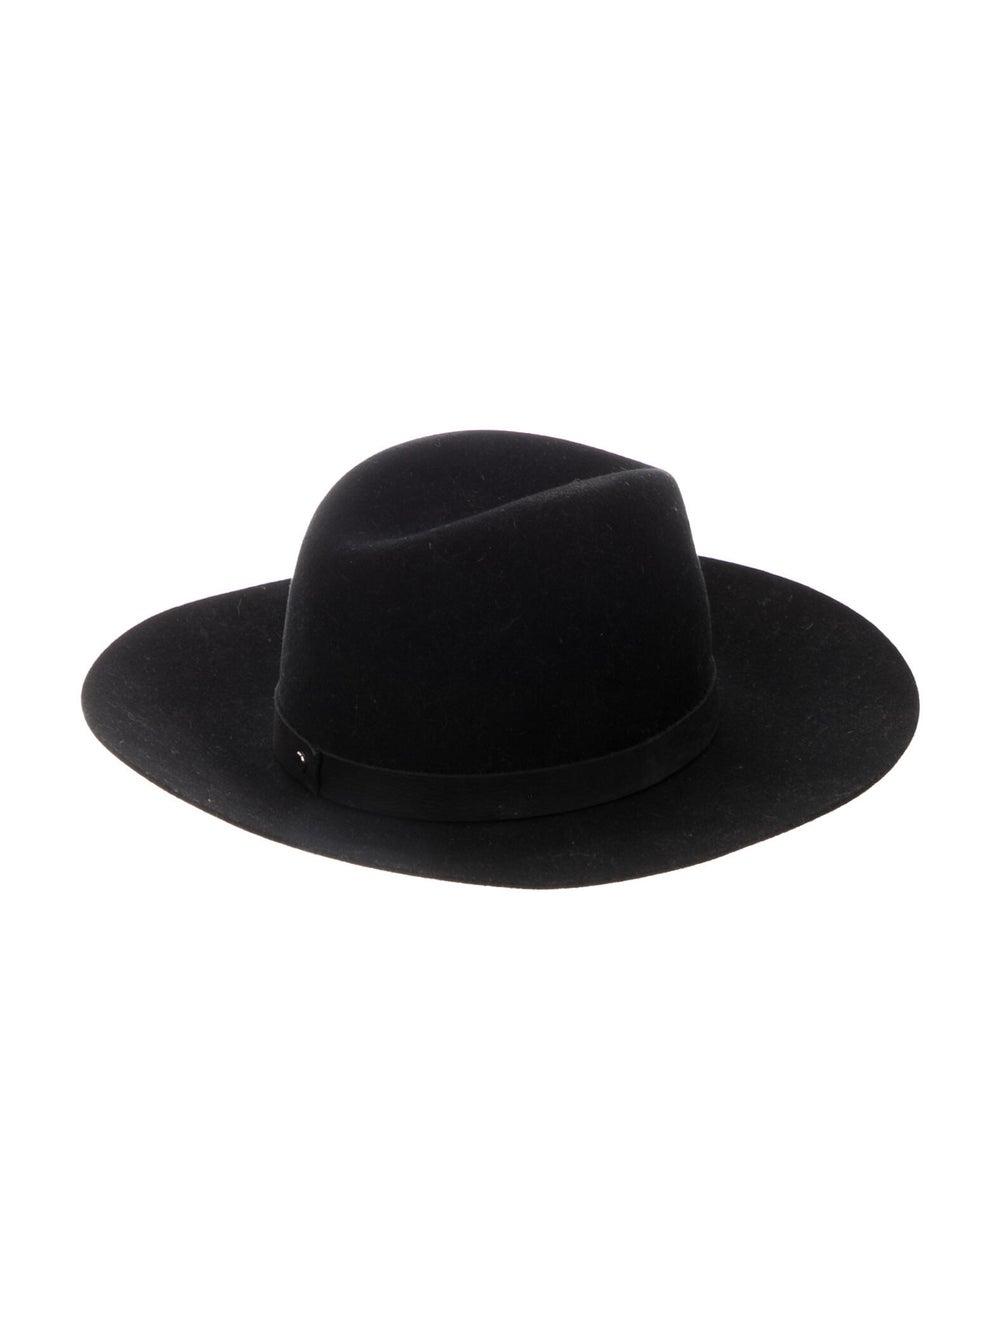 Janessa Leone Wool Fedora Hat Black - image 2